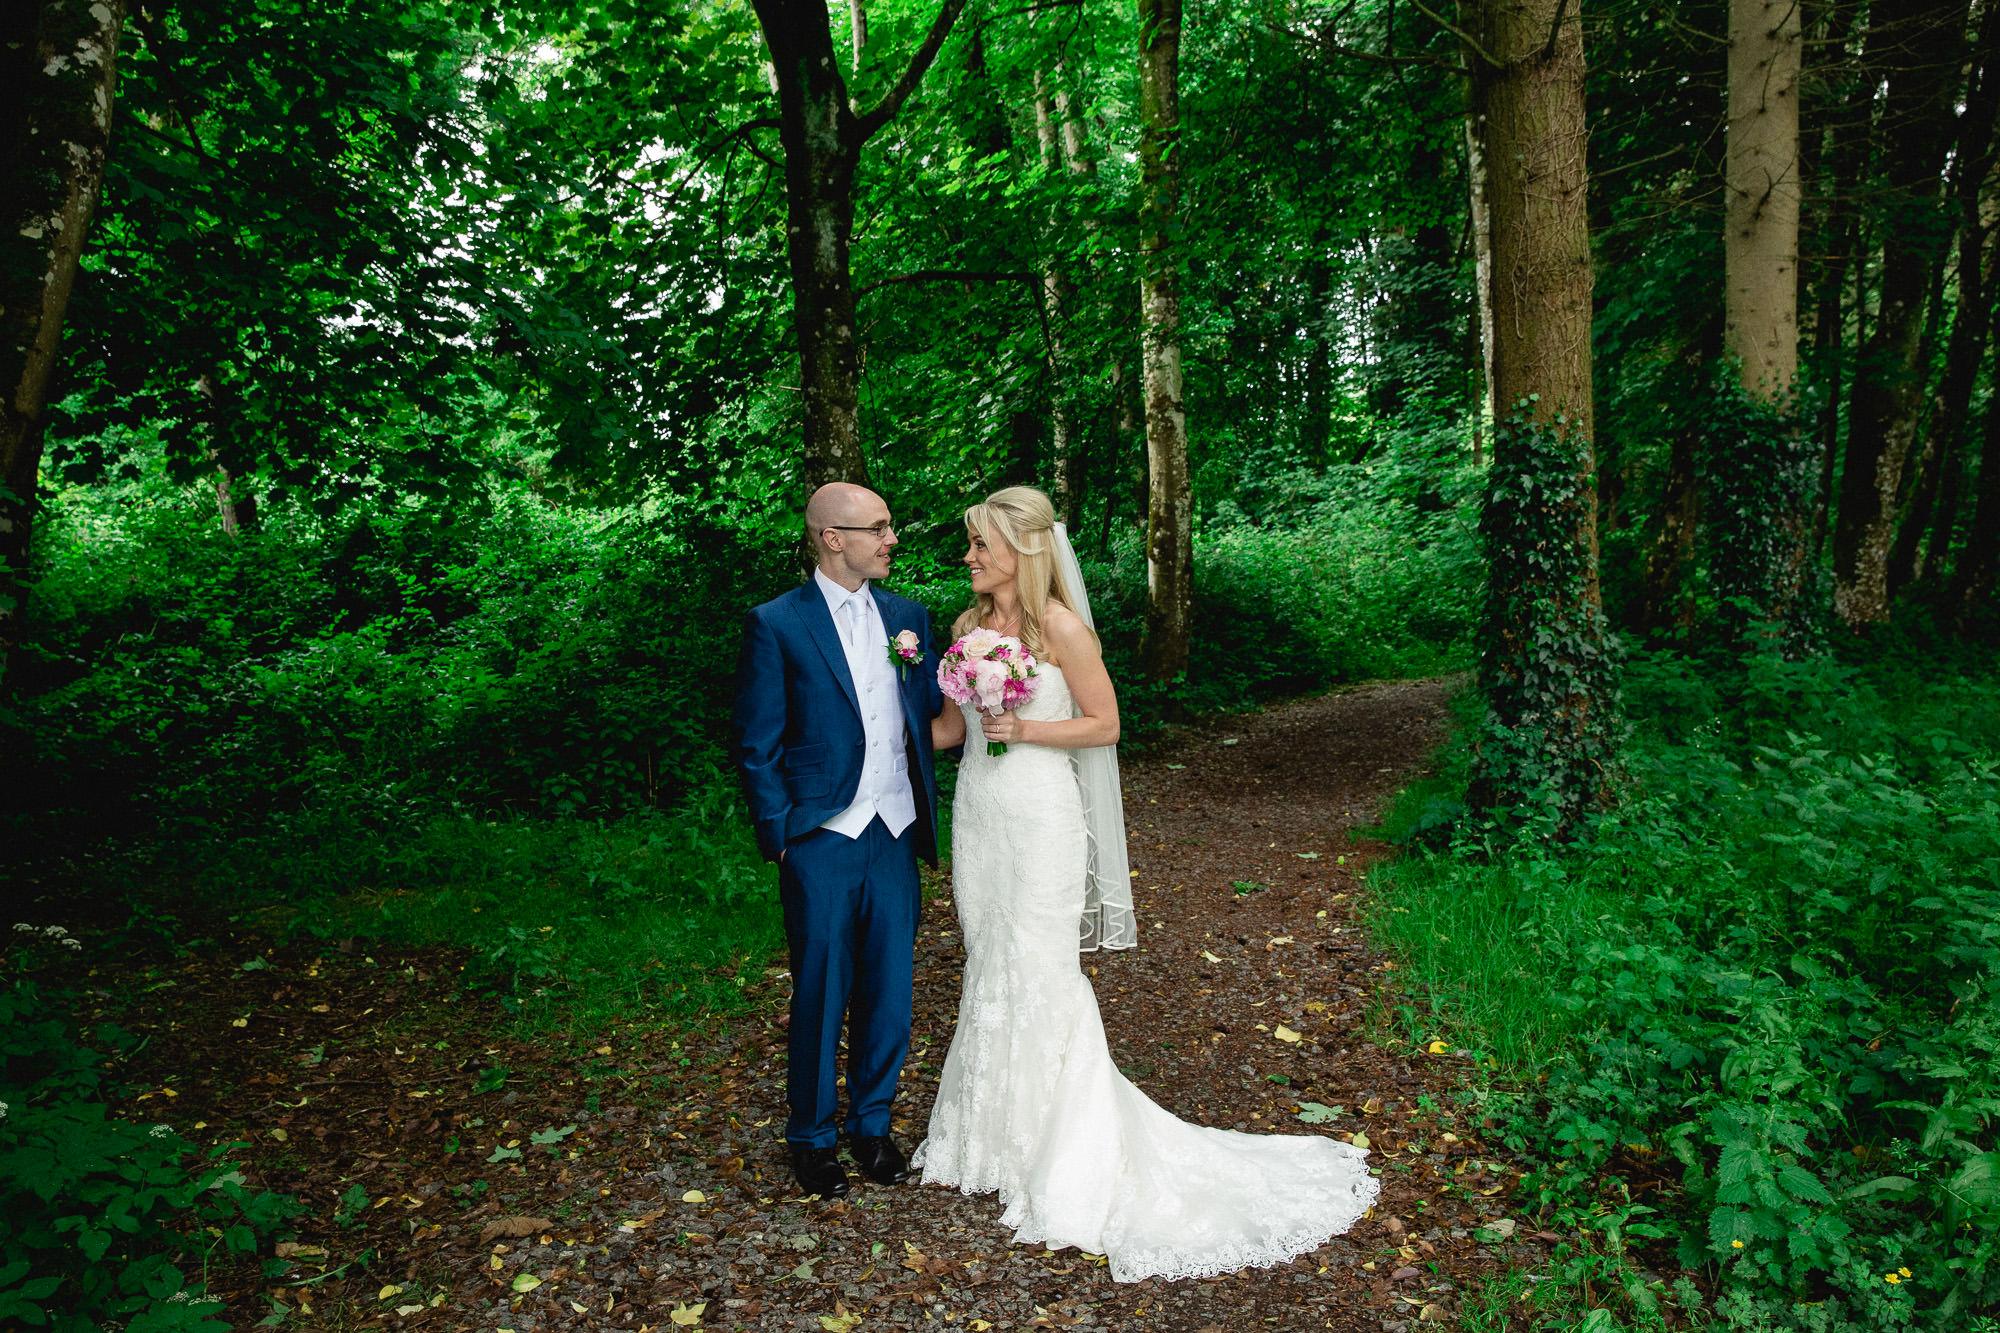 CLAIREBYRNEPHOTOGRAPHY-WEDDING-Ireland-tulffaris-alternative-fun-Lisa-terry-6.jpg